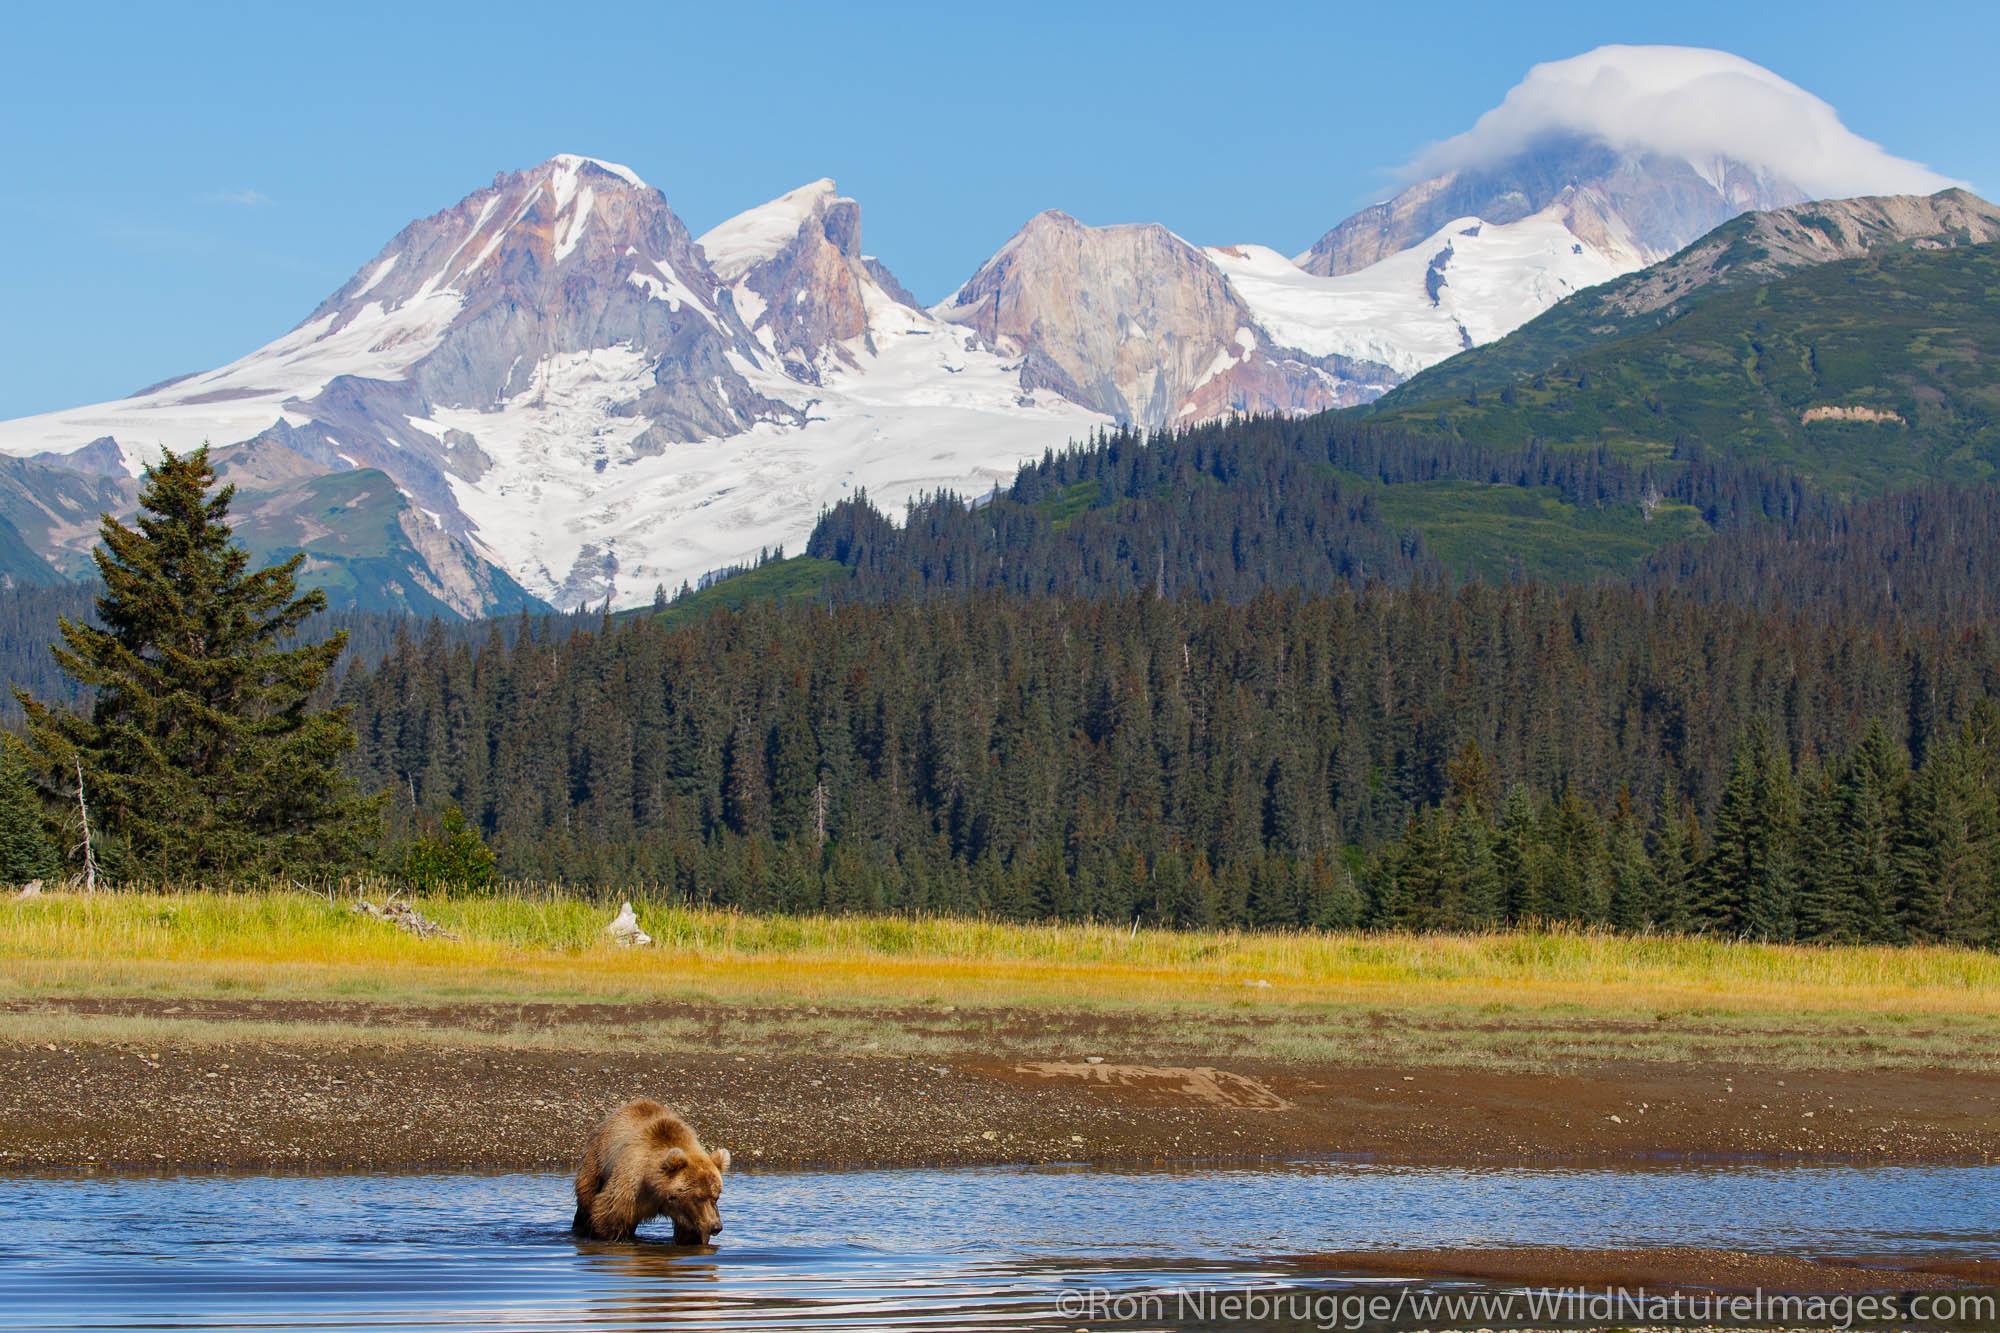 Brown / Grizzly Bear with Mount Iliamna volcano, Lake Clark National Park, Alaska.